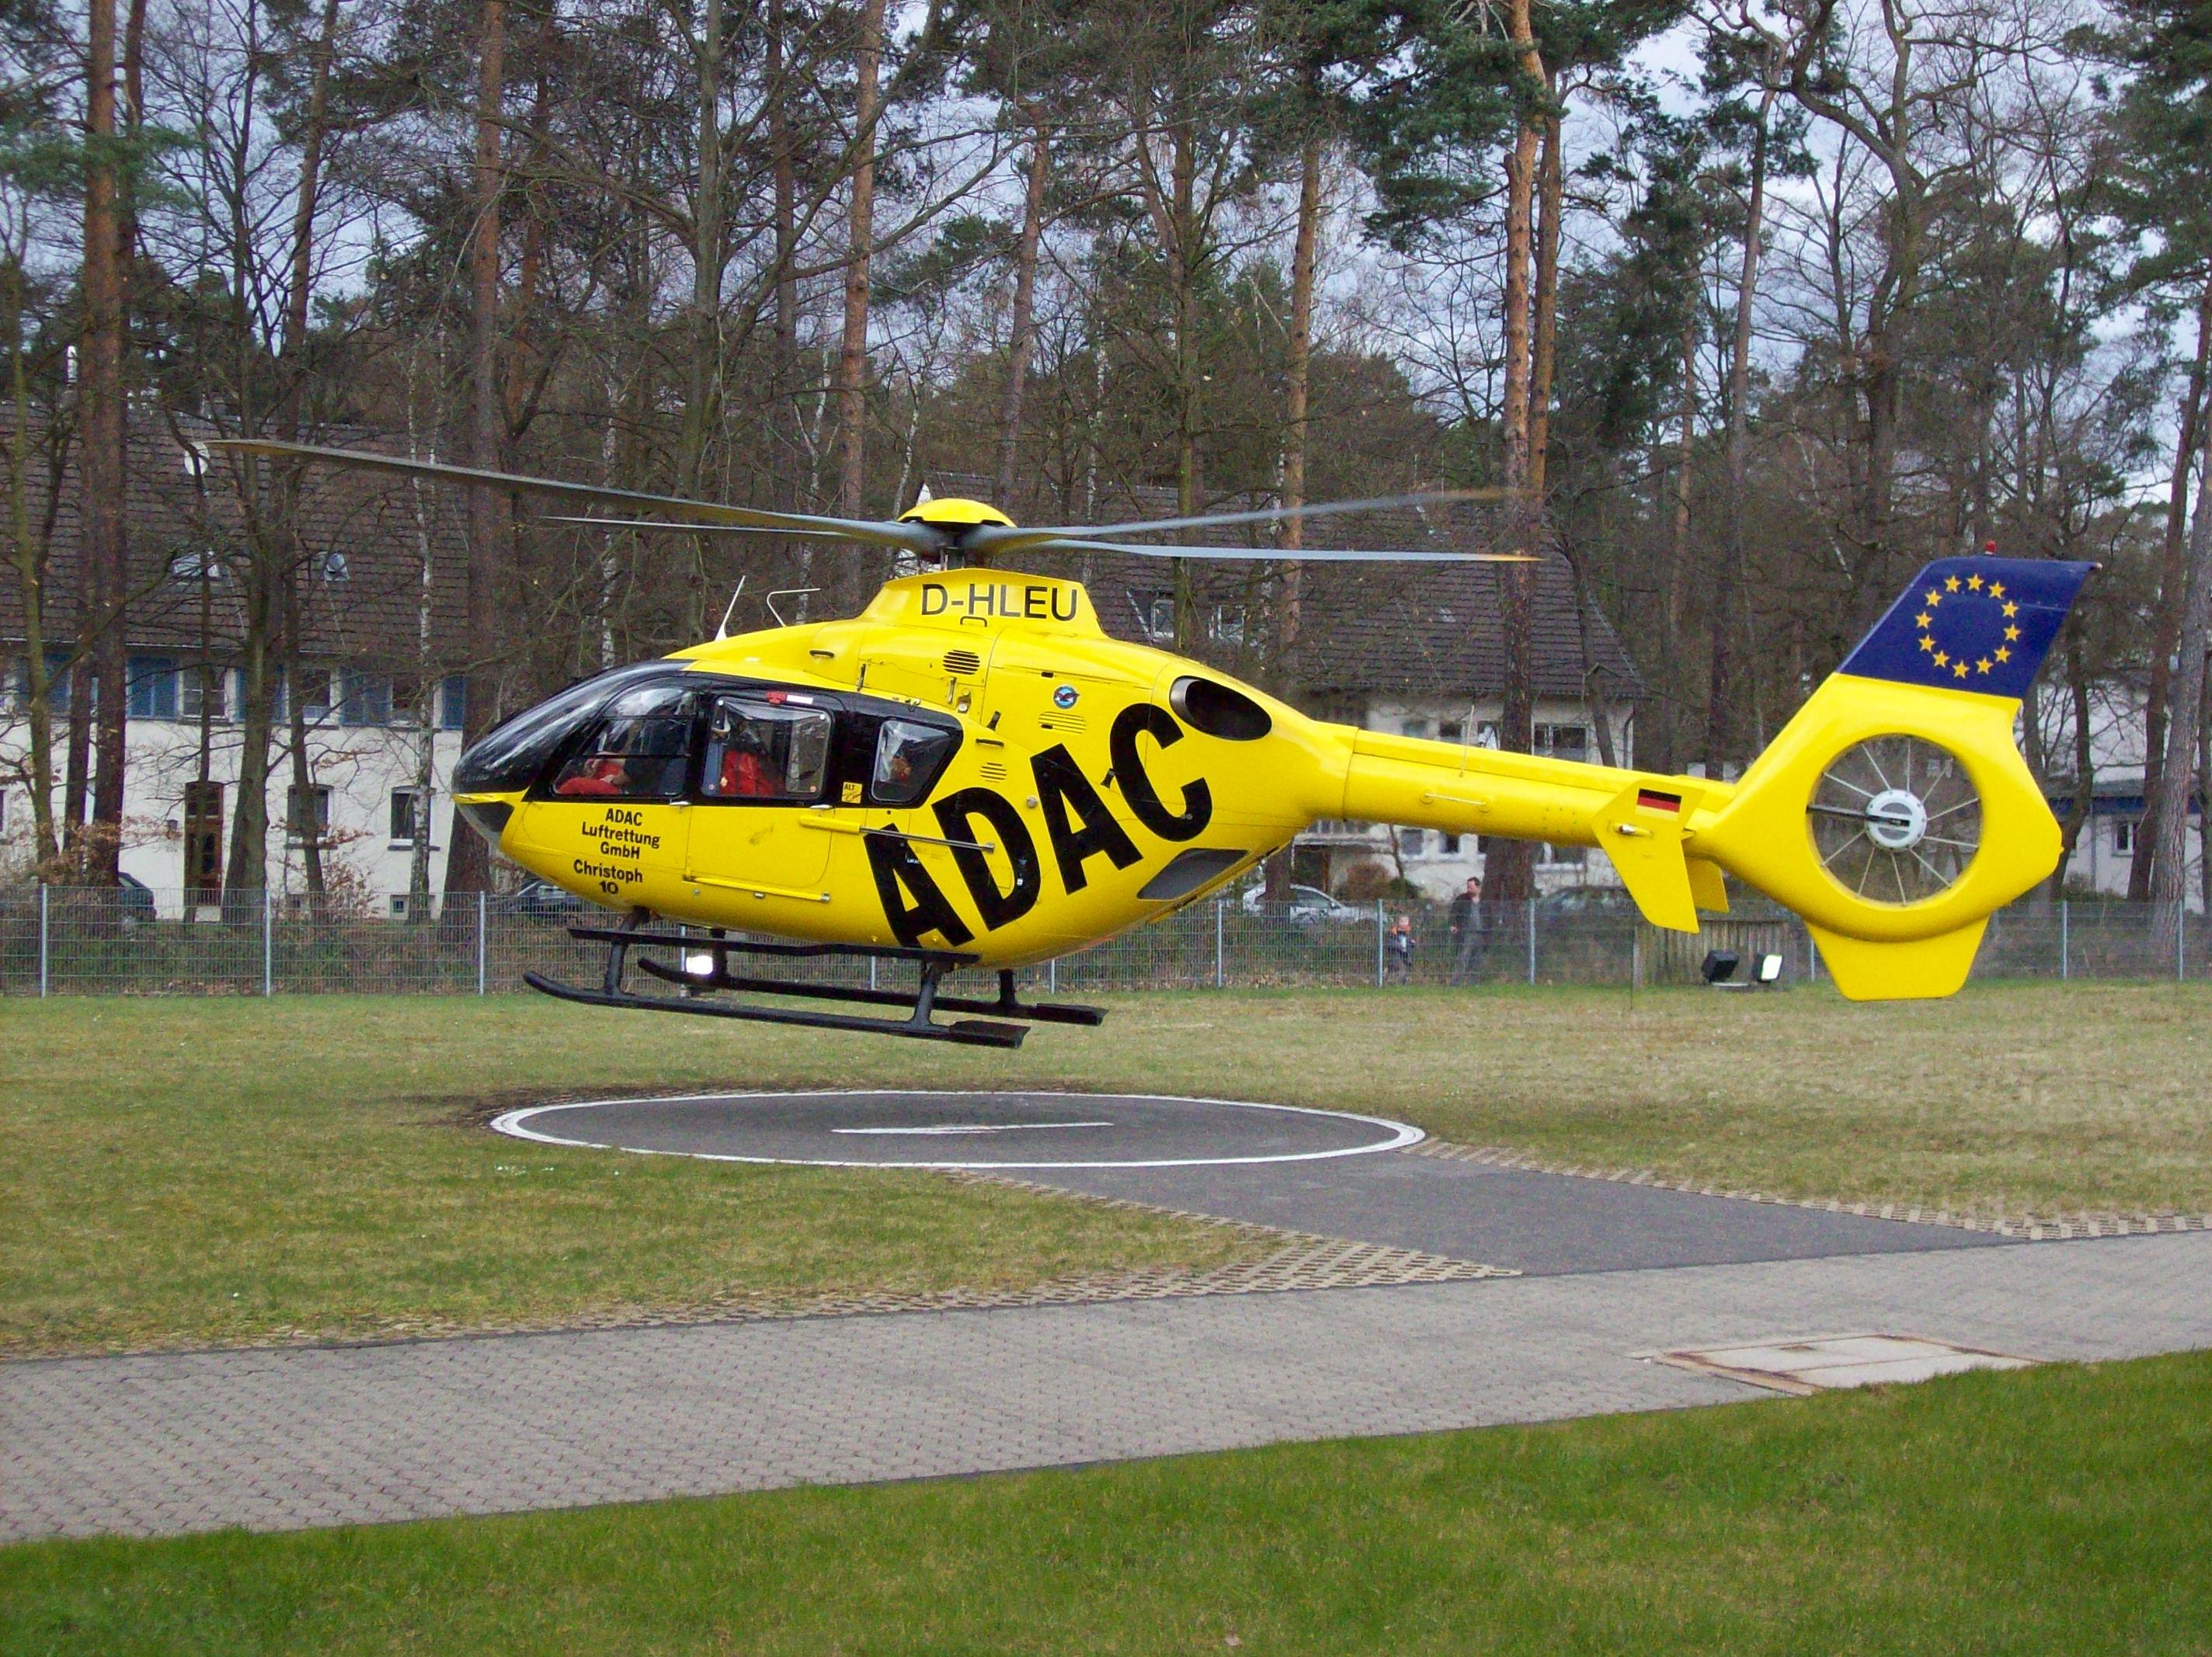 Elicottero Ec 135 : File helicopter ec taking off from bonn university